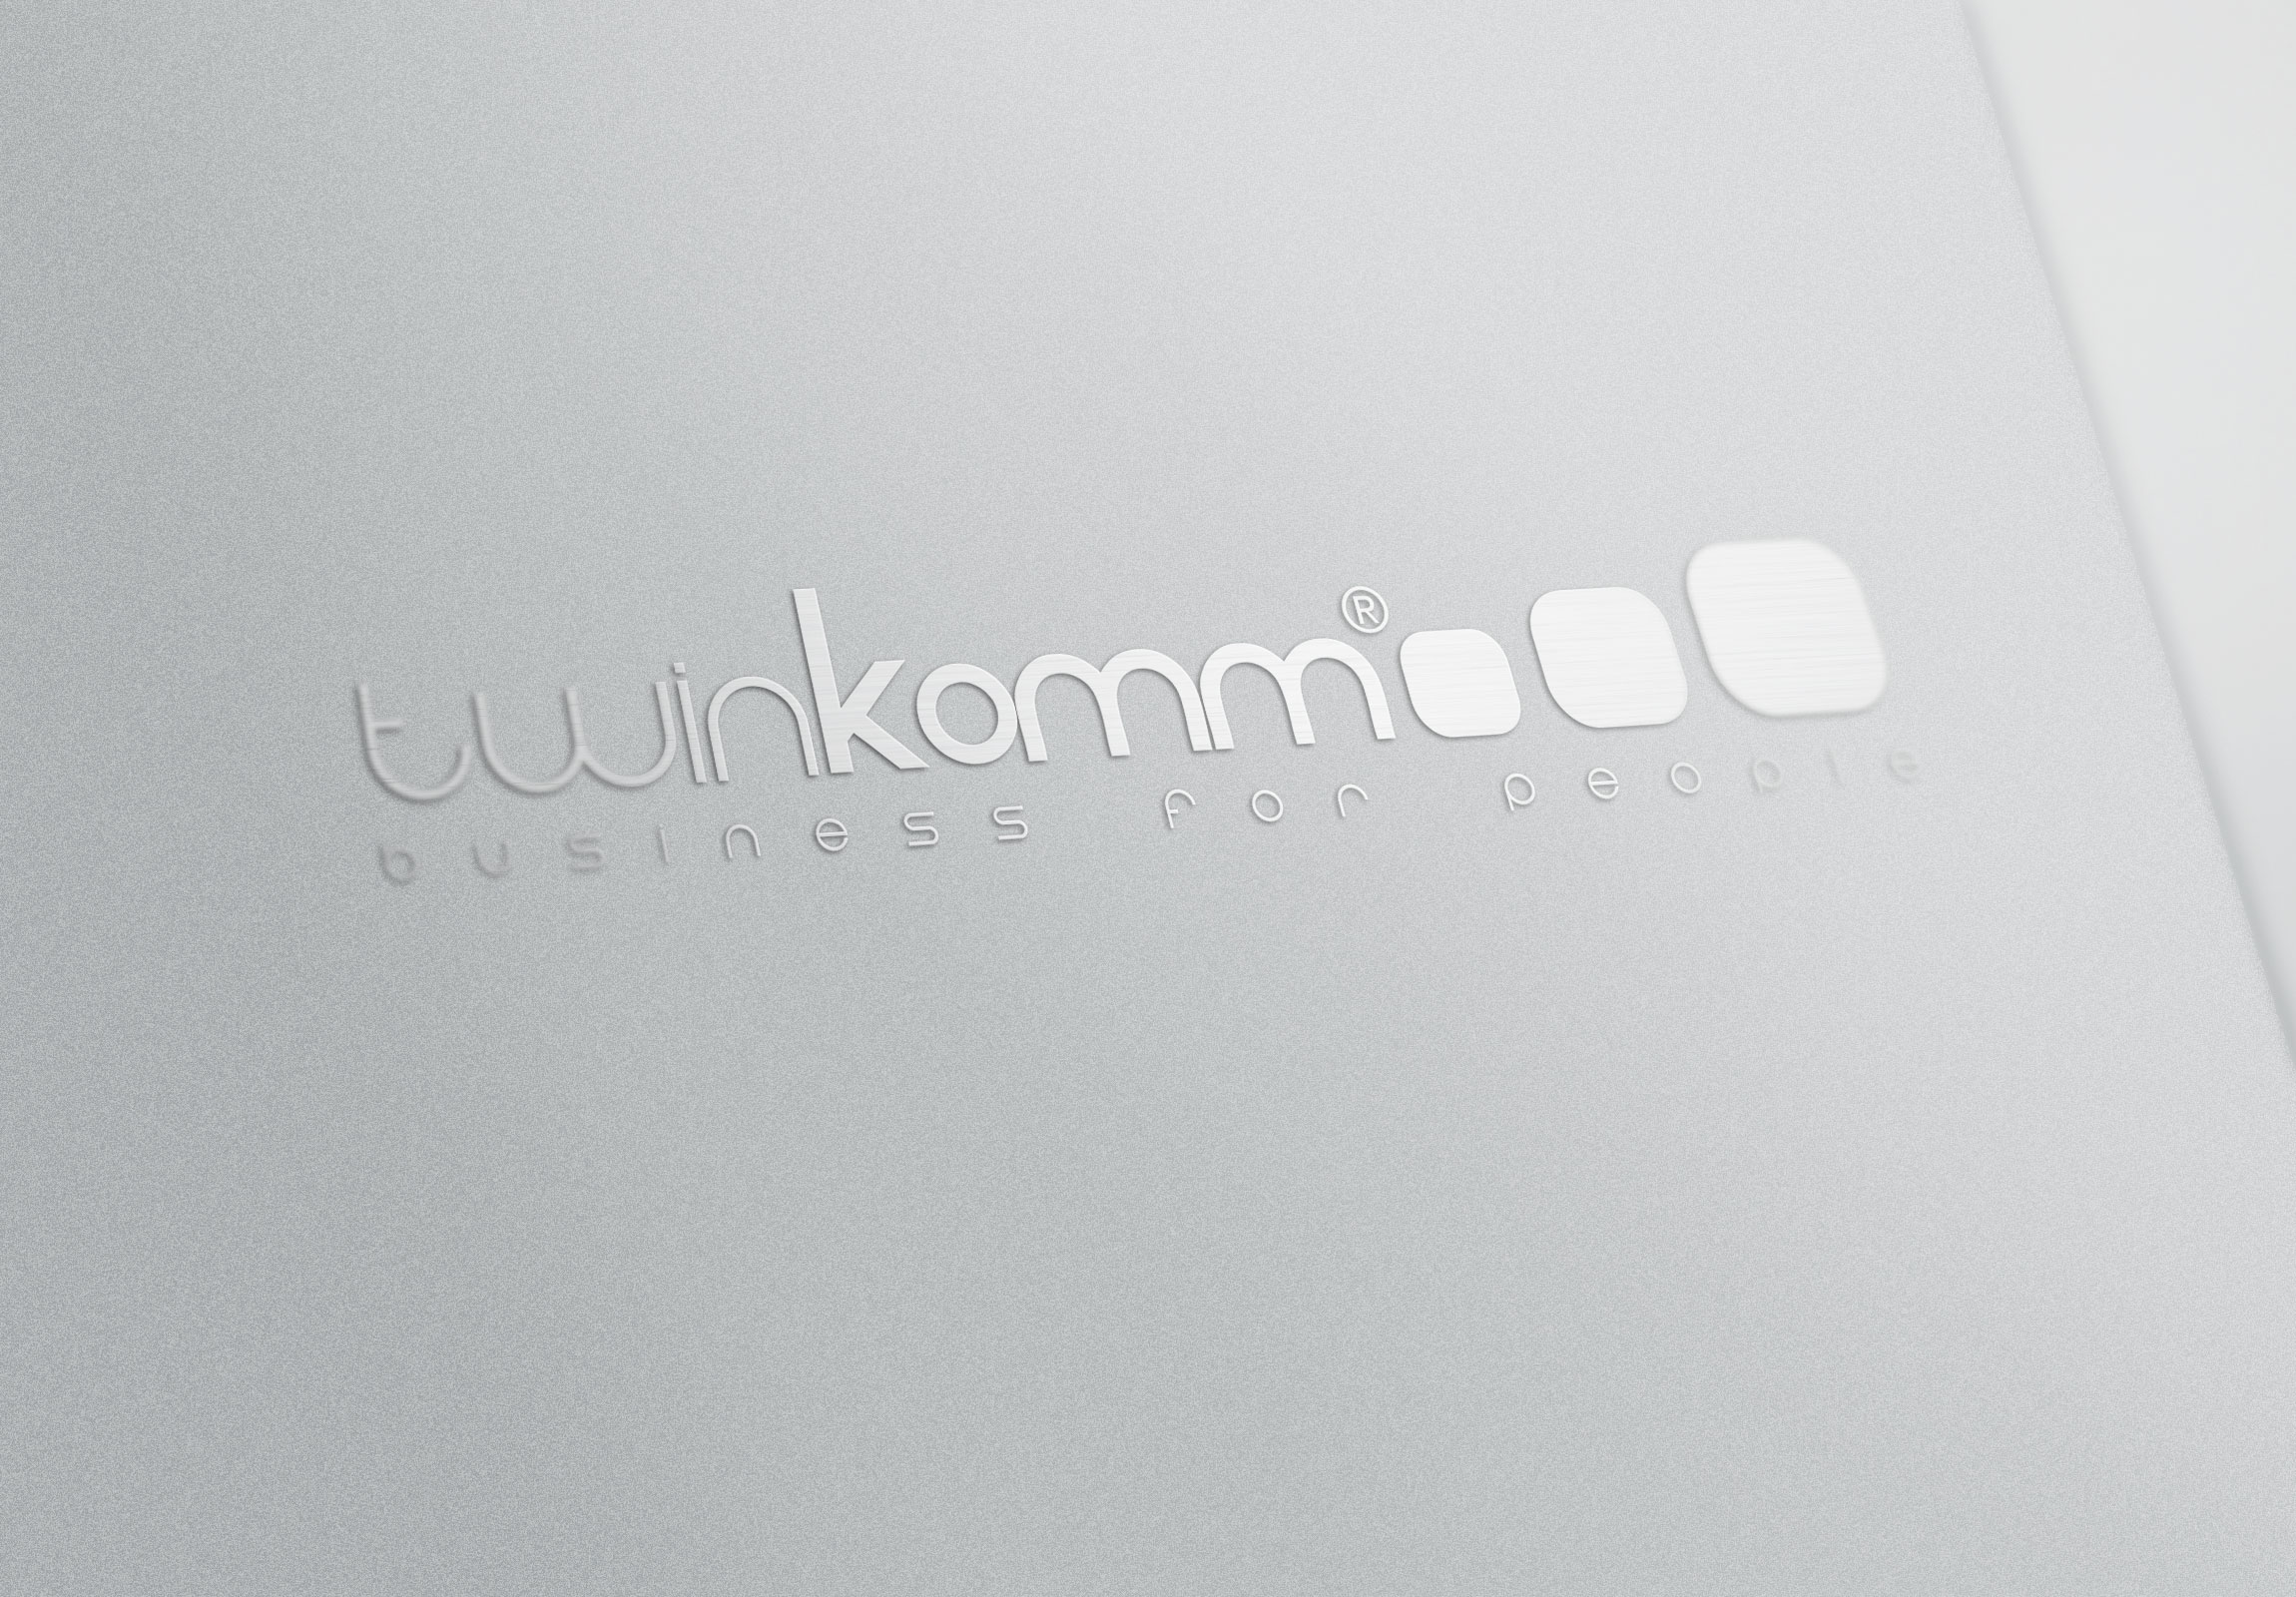 Logodesign Twinkomm